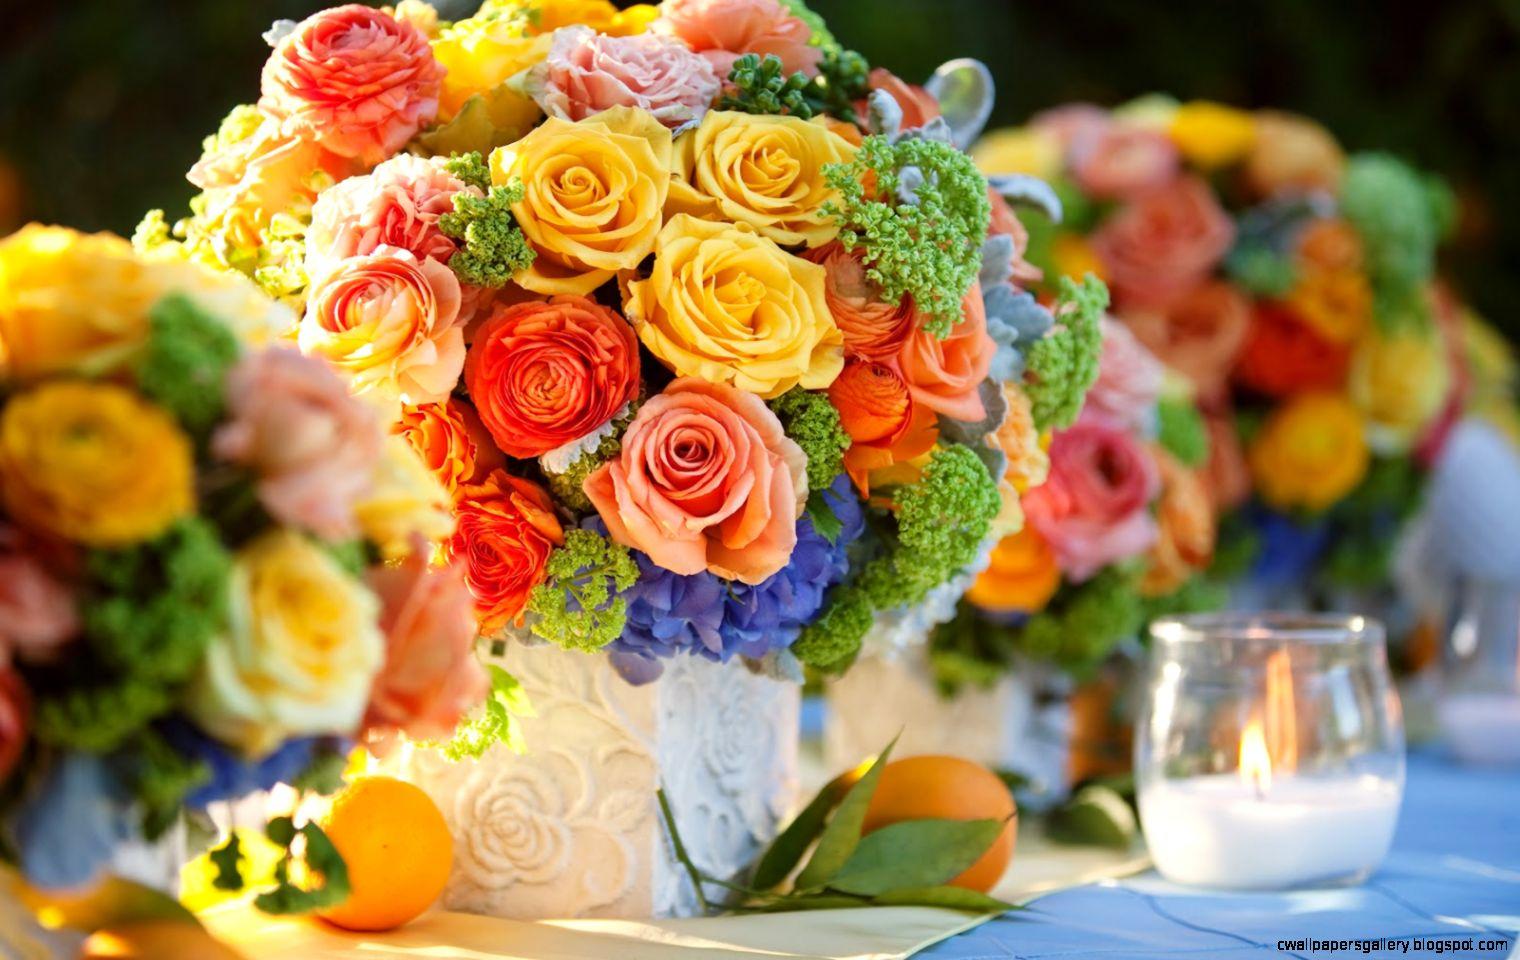 Colorful Wedding Centerpiece Flowers For Summer Wedding  Flower